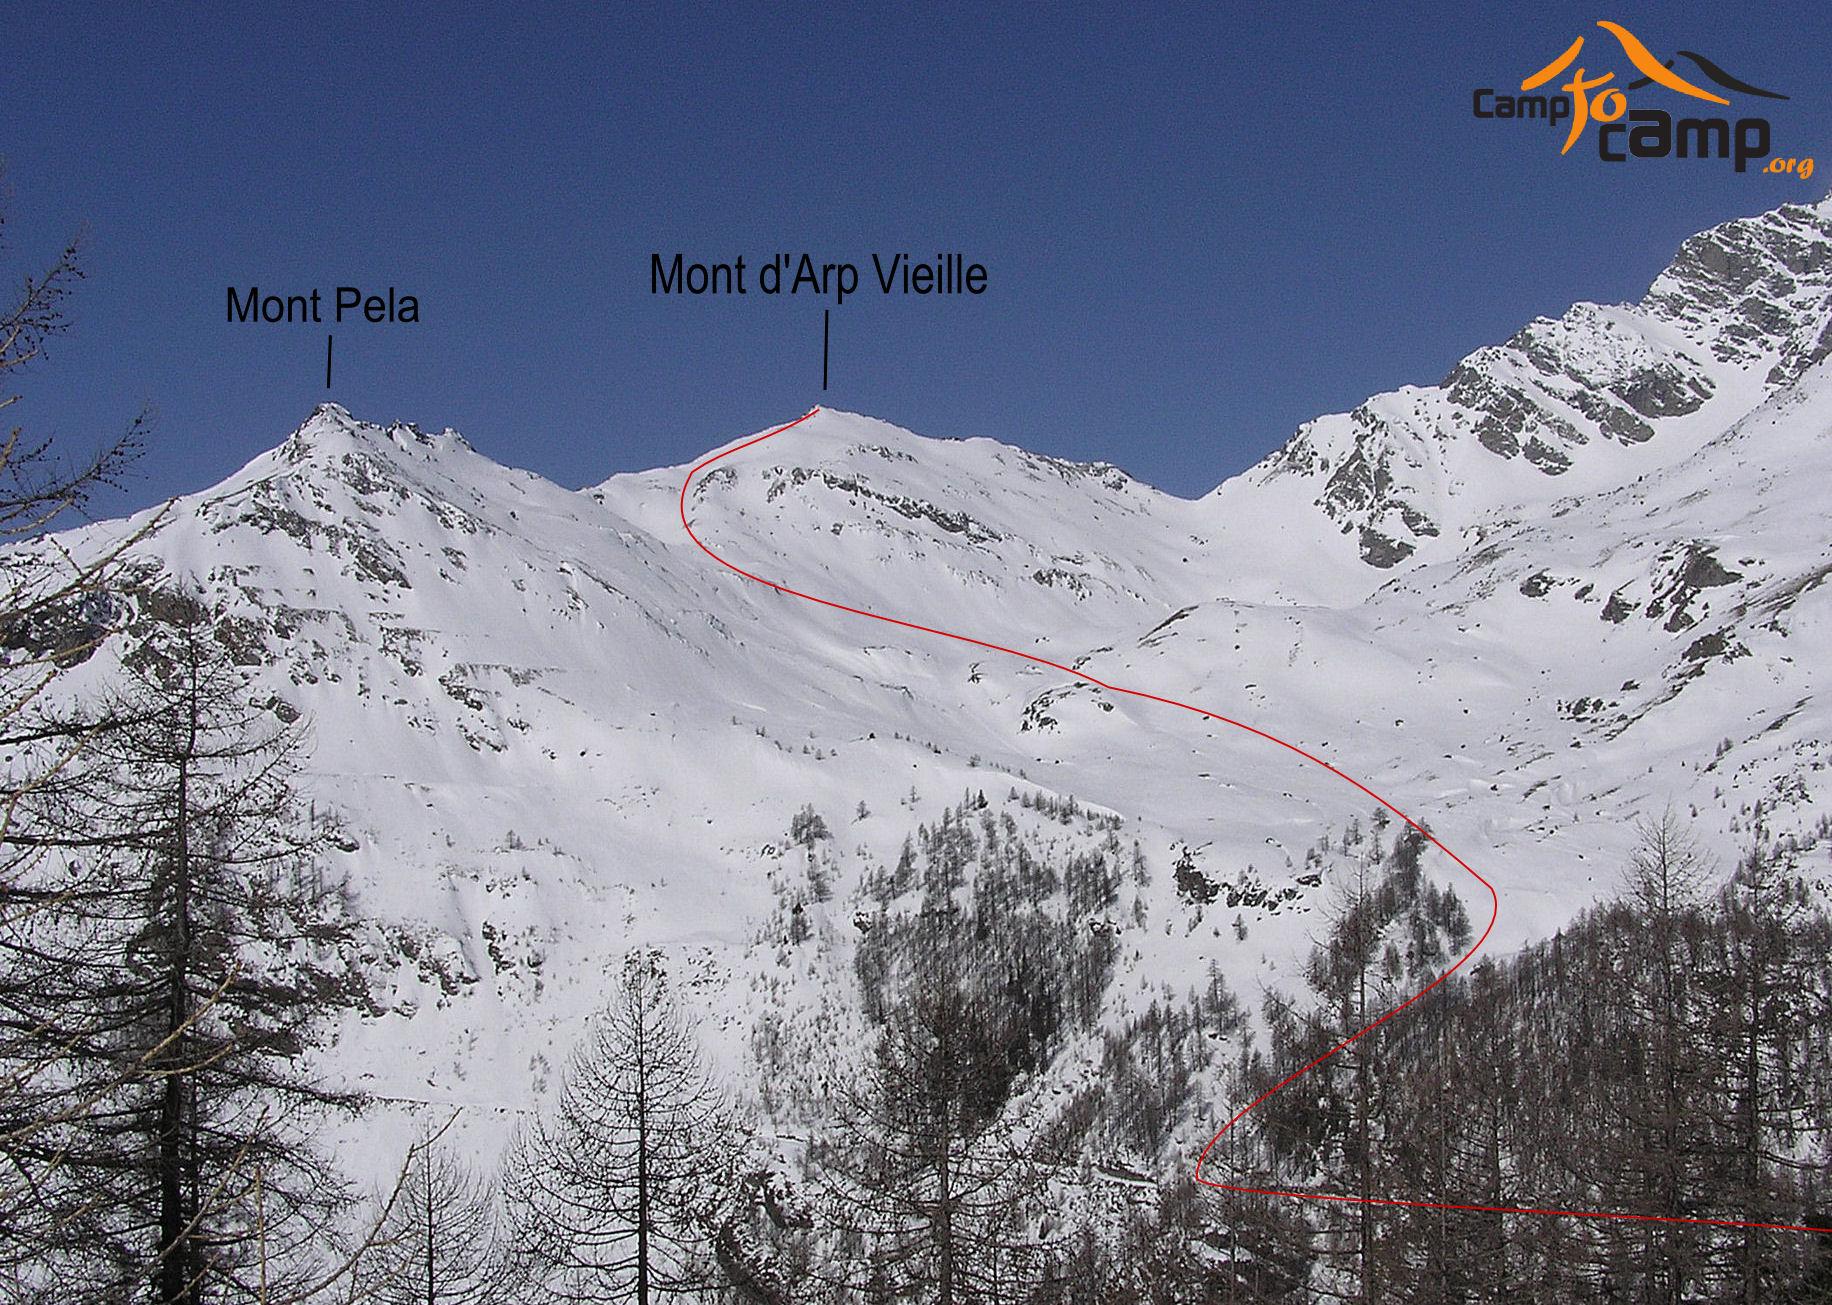 Mont Arp Vieille : da Valgrisenche - Camptocamp.org